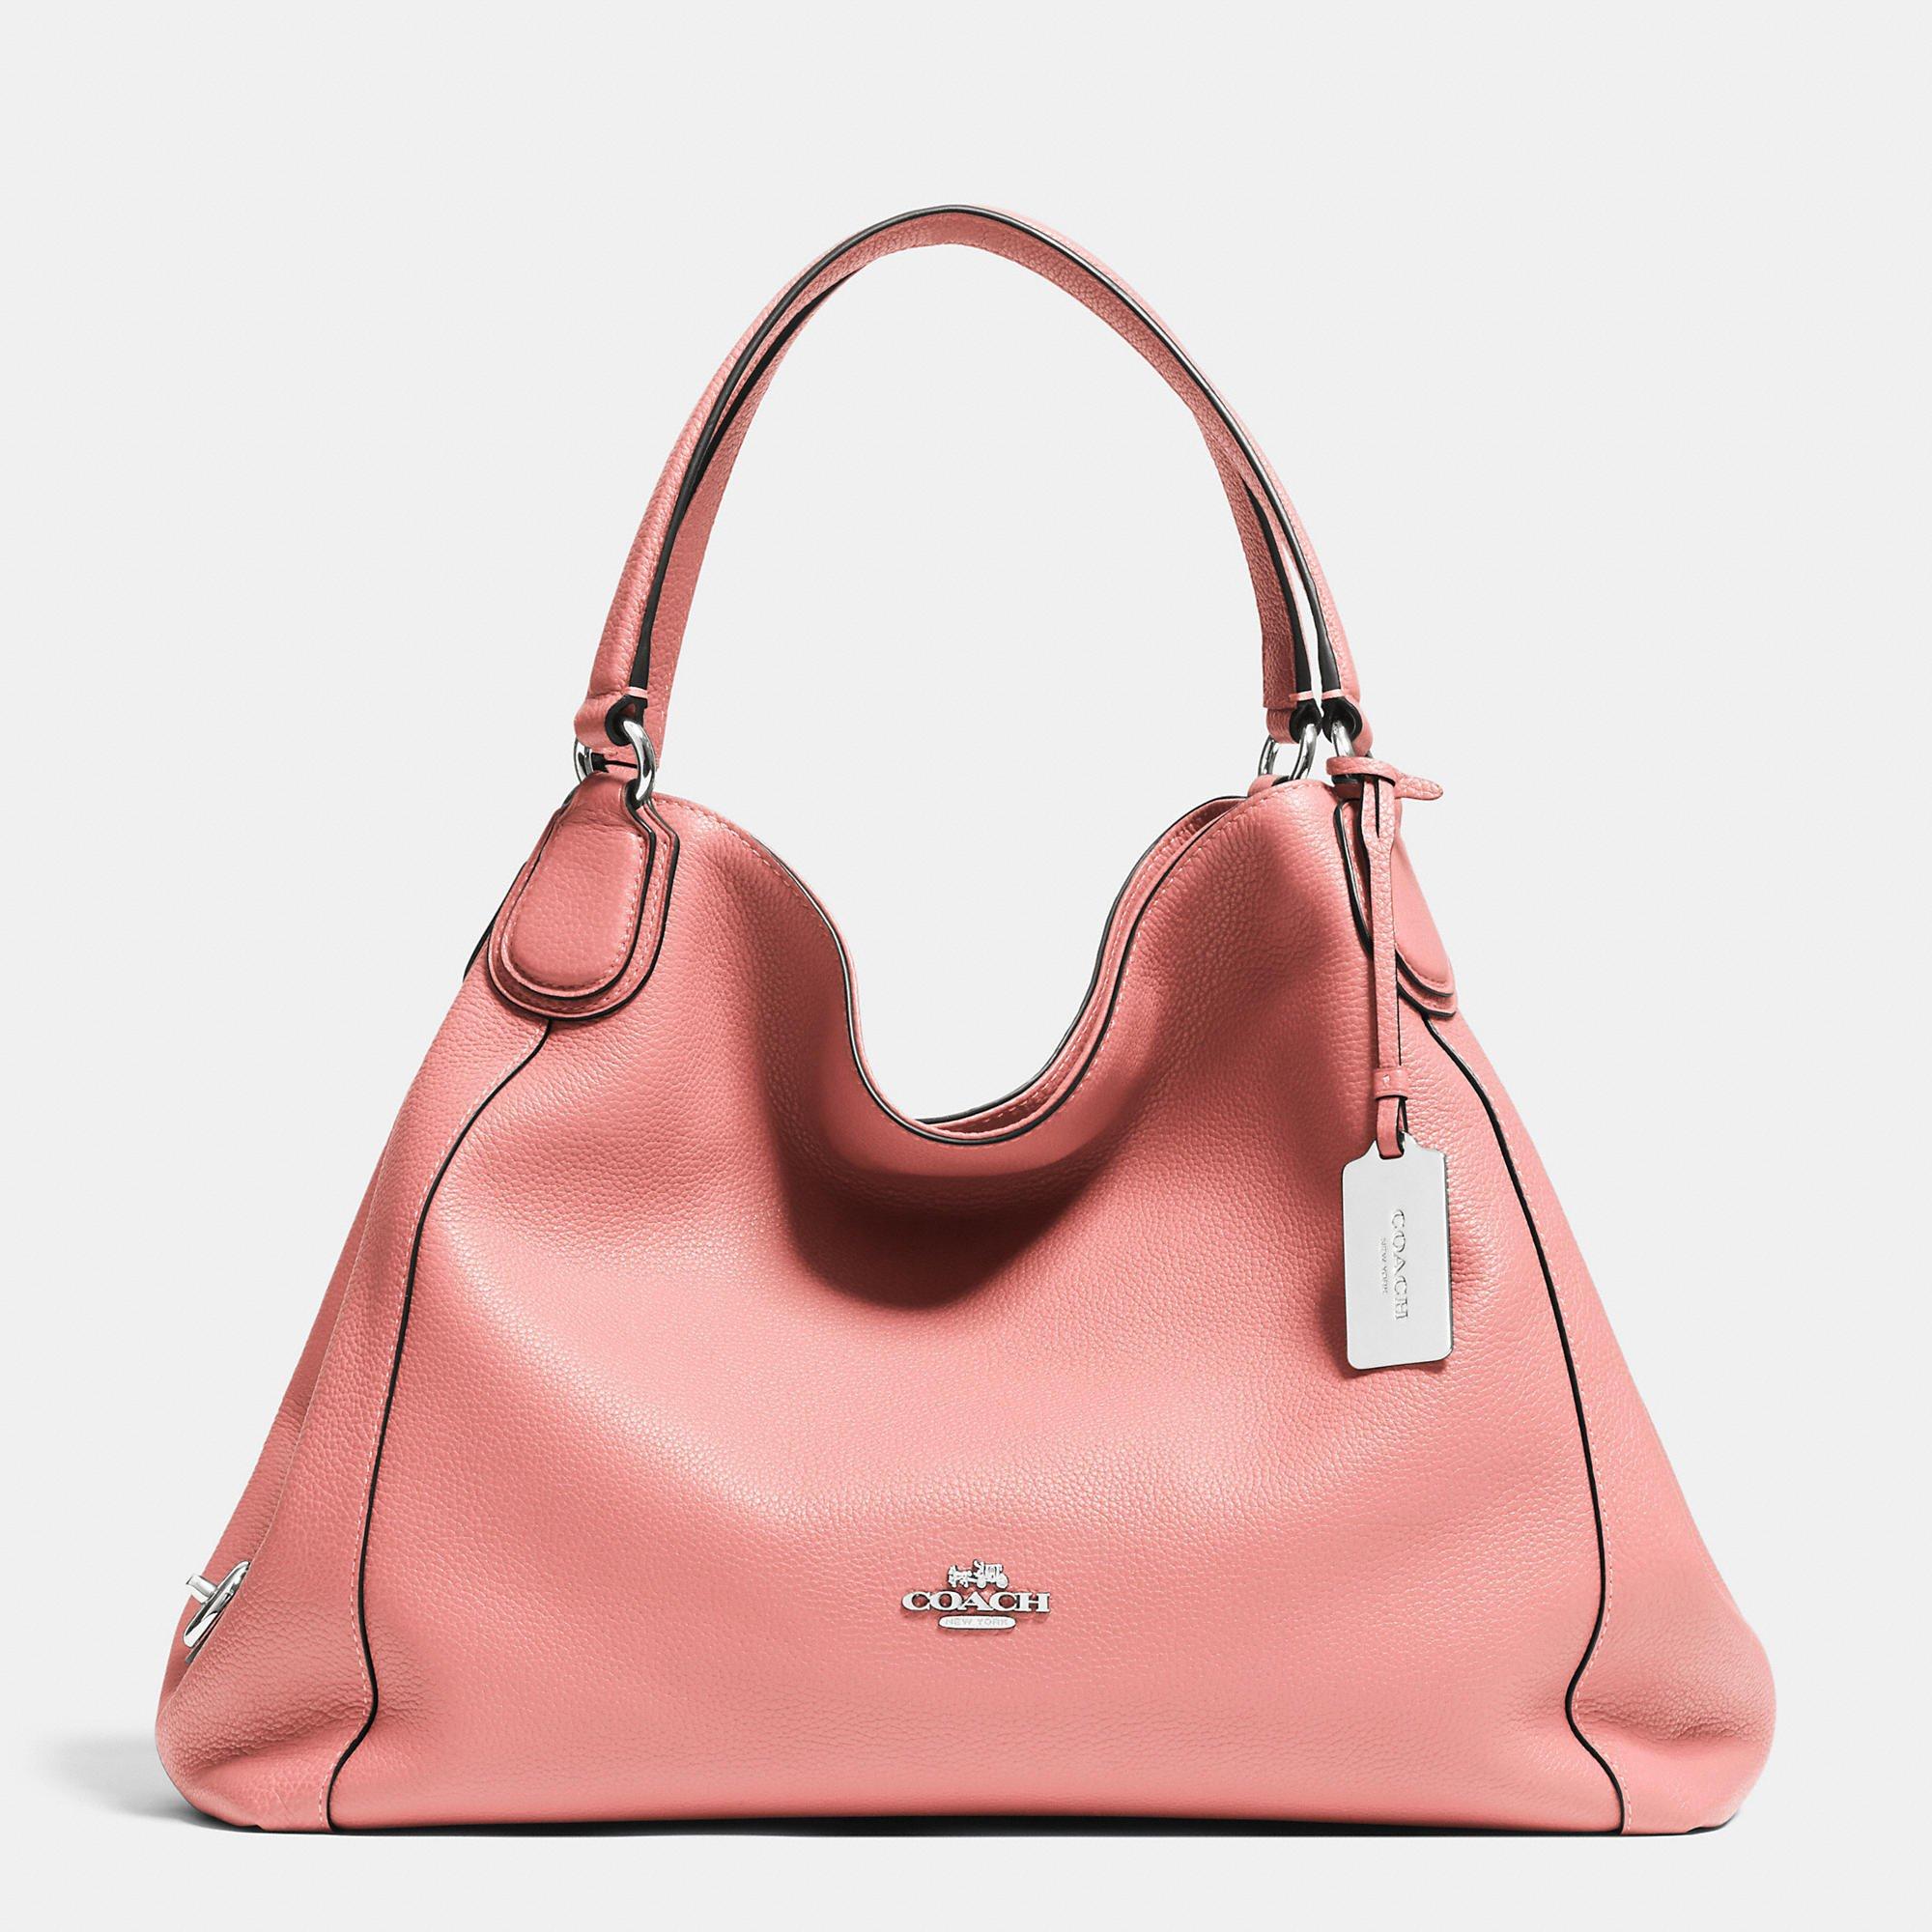 designer coach bags 8wi1  Gallery Women's Coach Edie